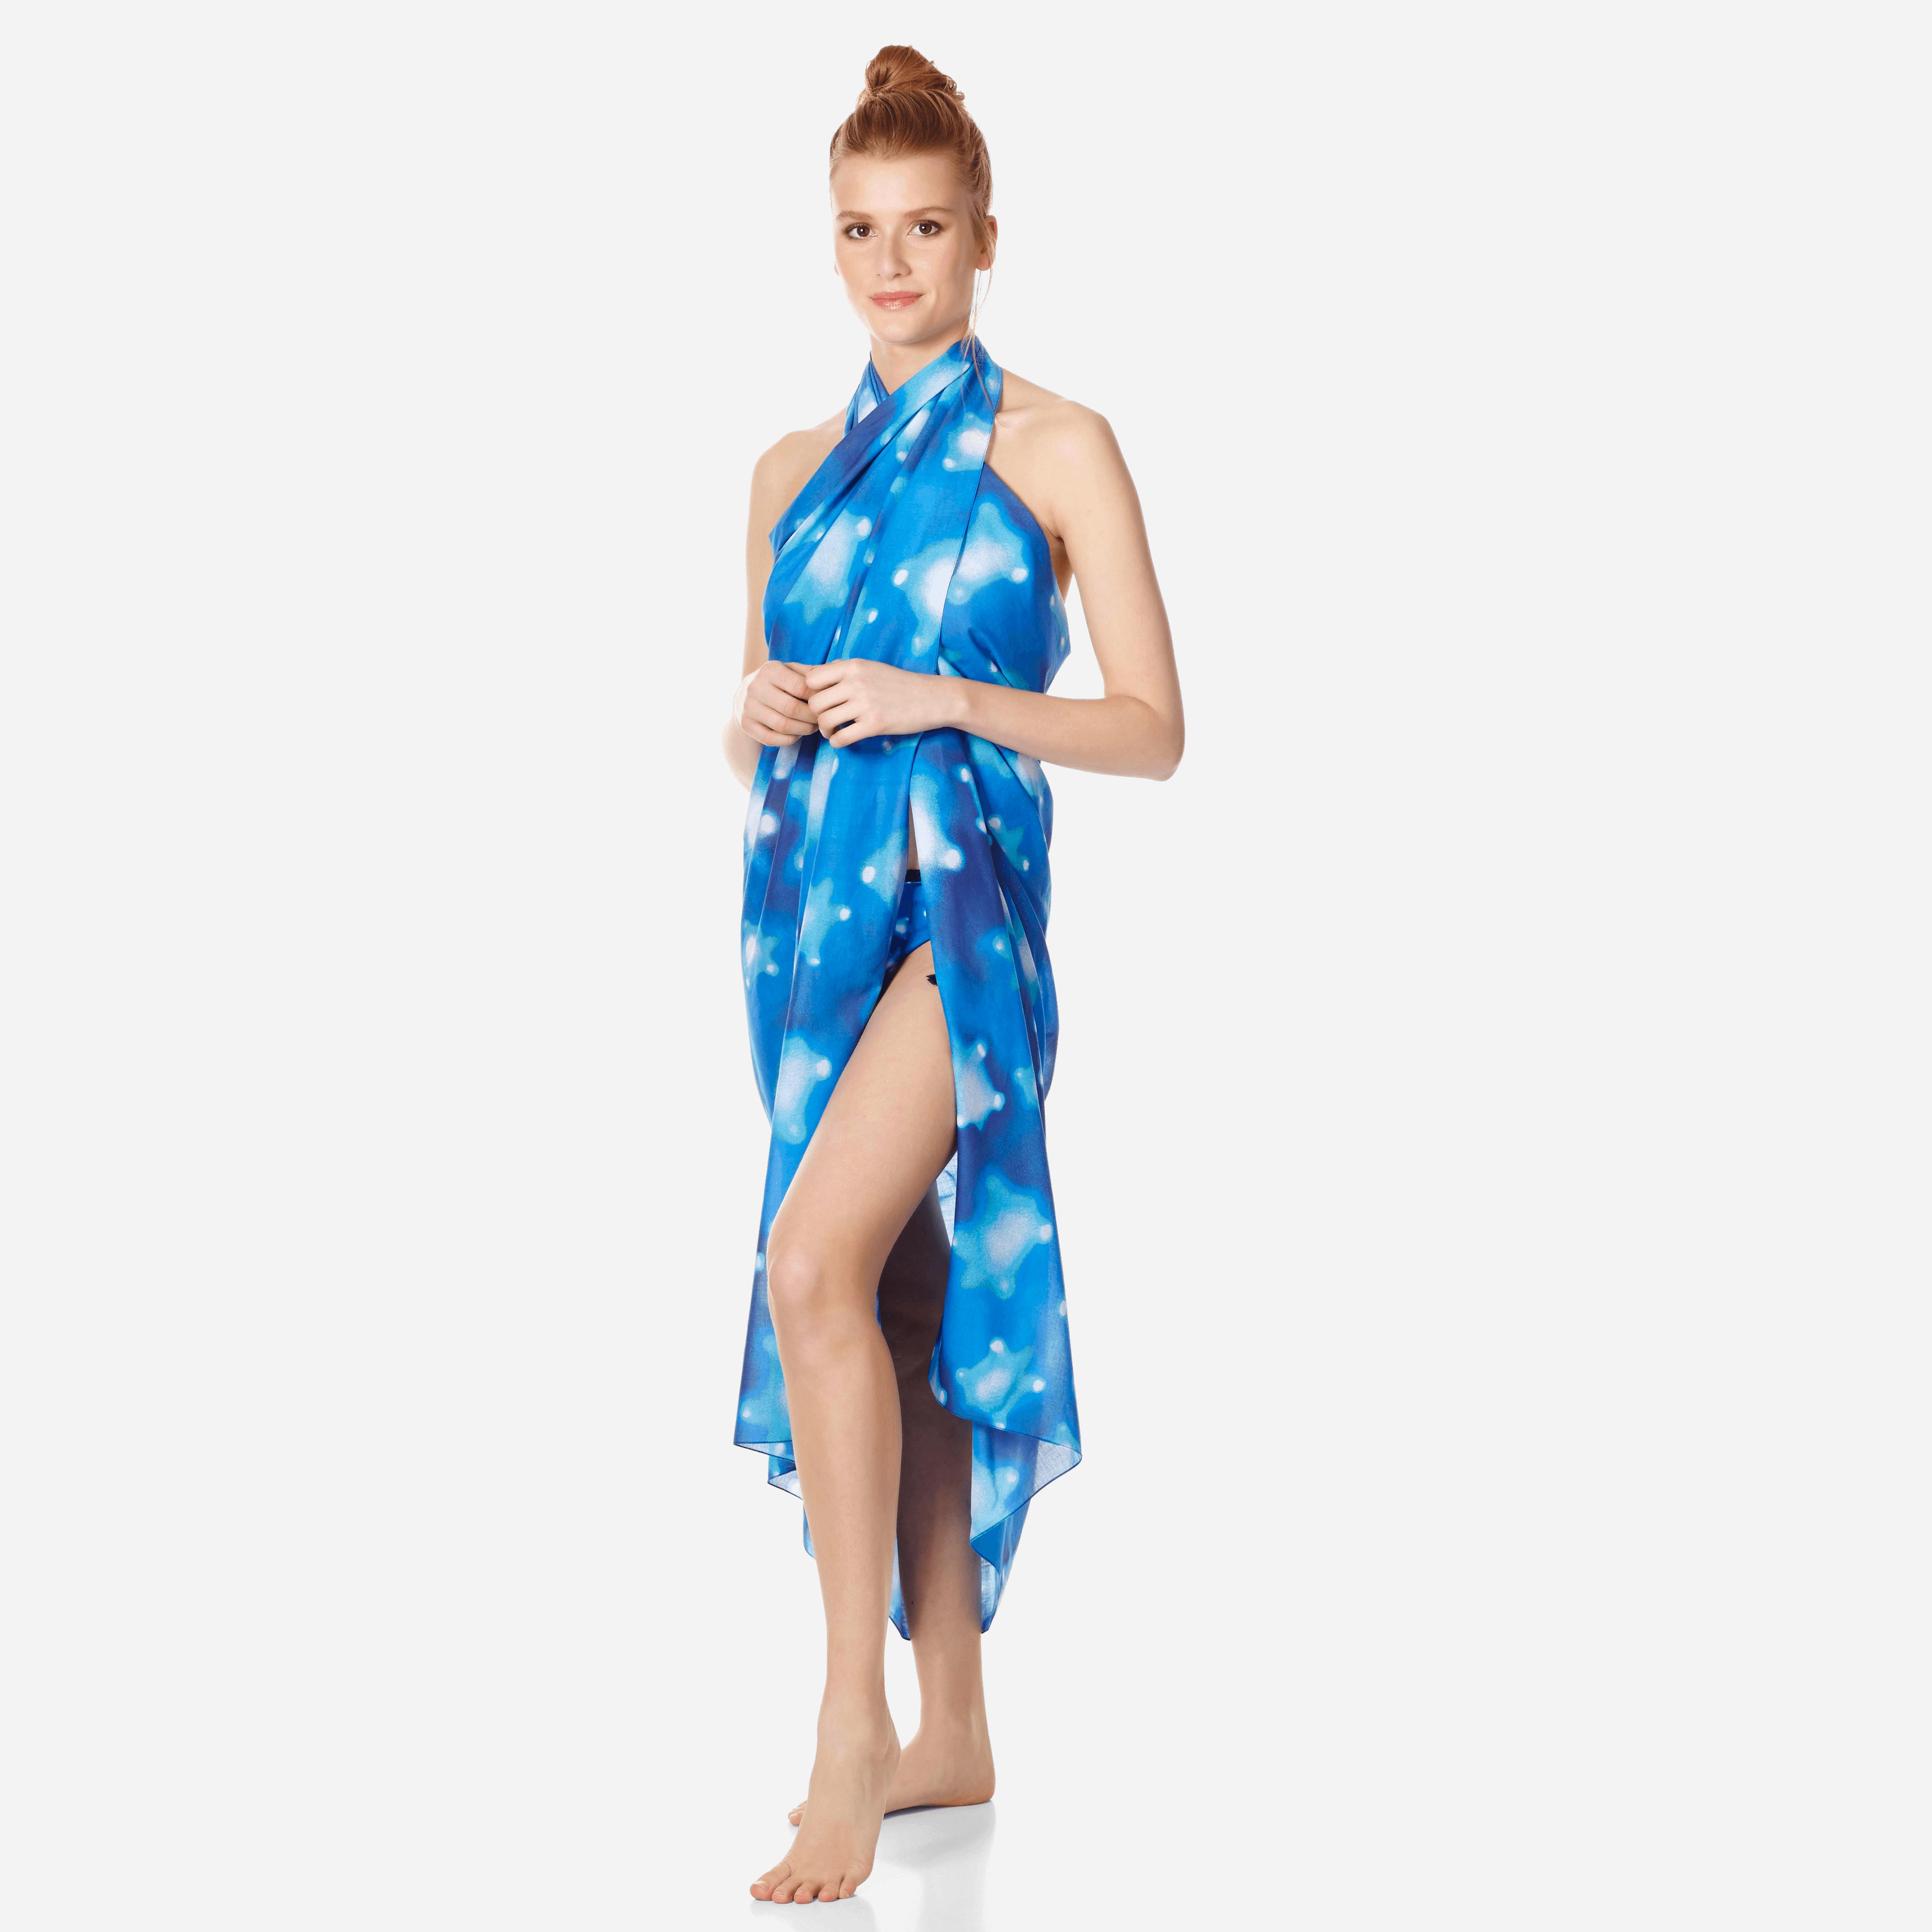 VILEBREQUIN | Accessories - Cotton Pareo Crystal Turtles - PAREO - PAREO - Blue - OSFA - Vilebrequin | Goxip